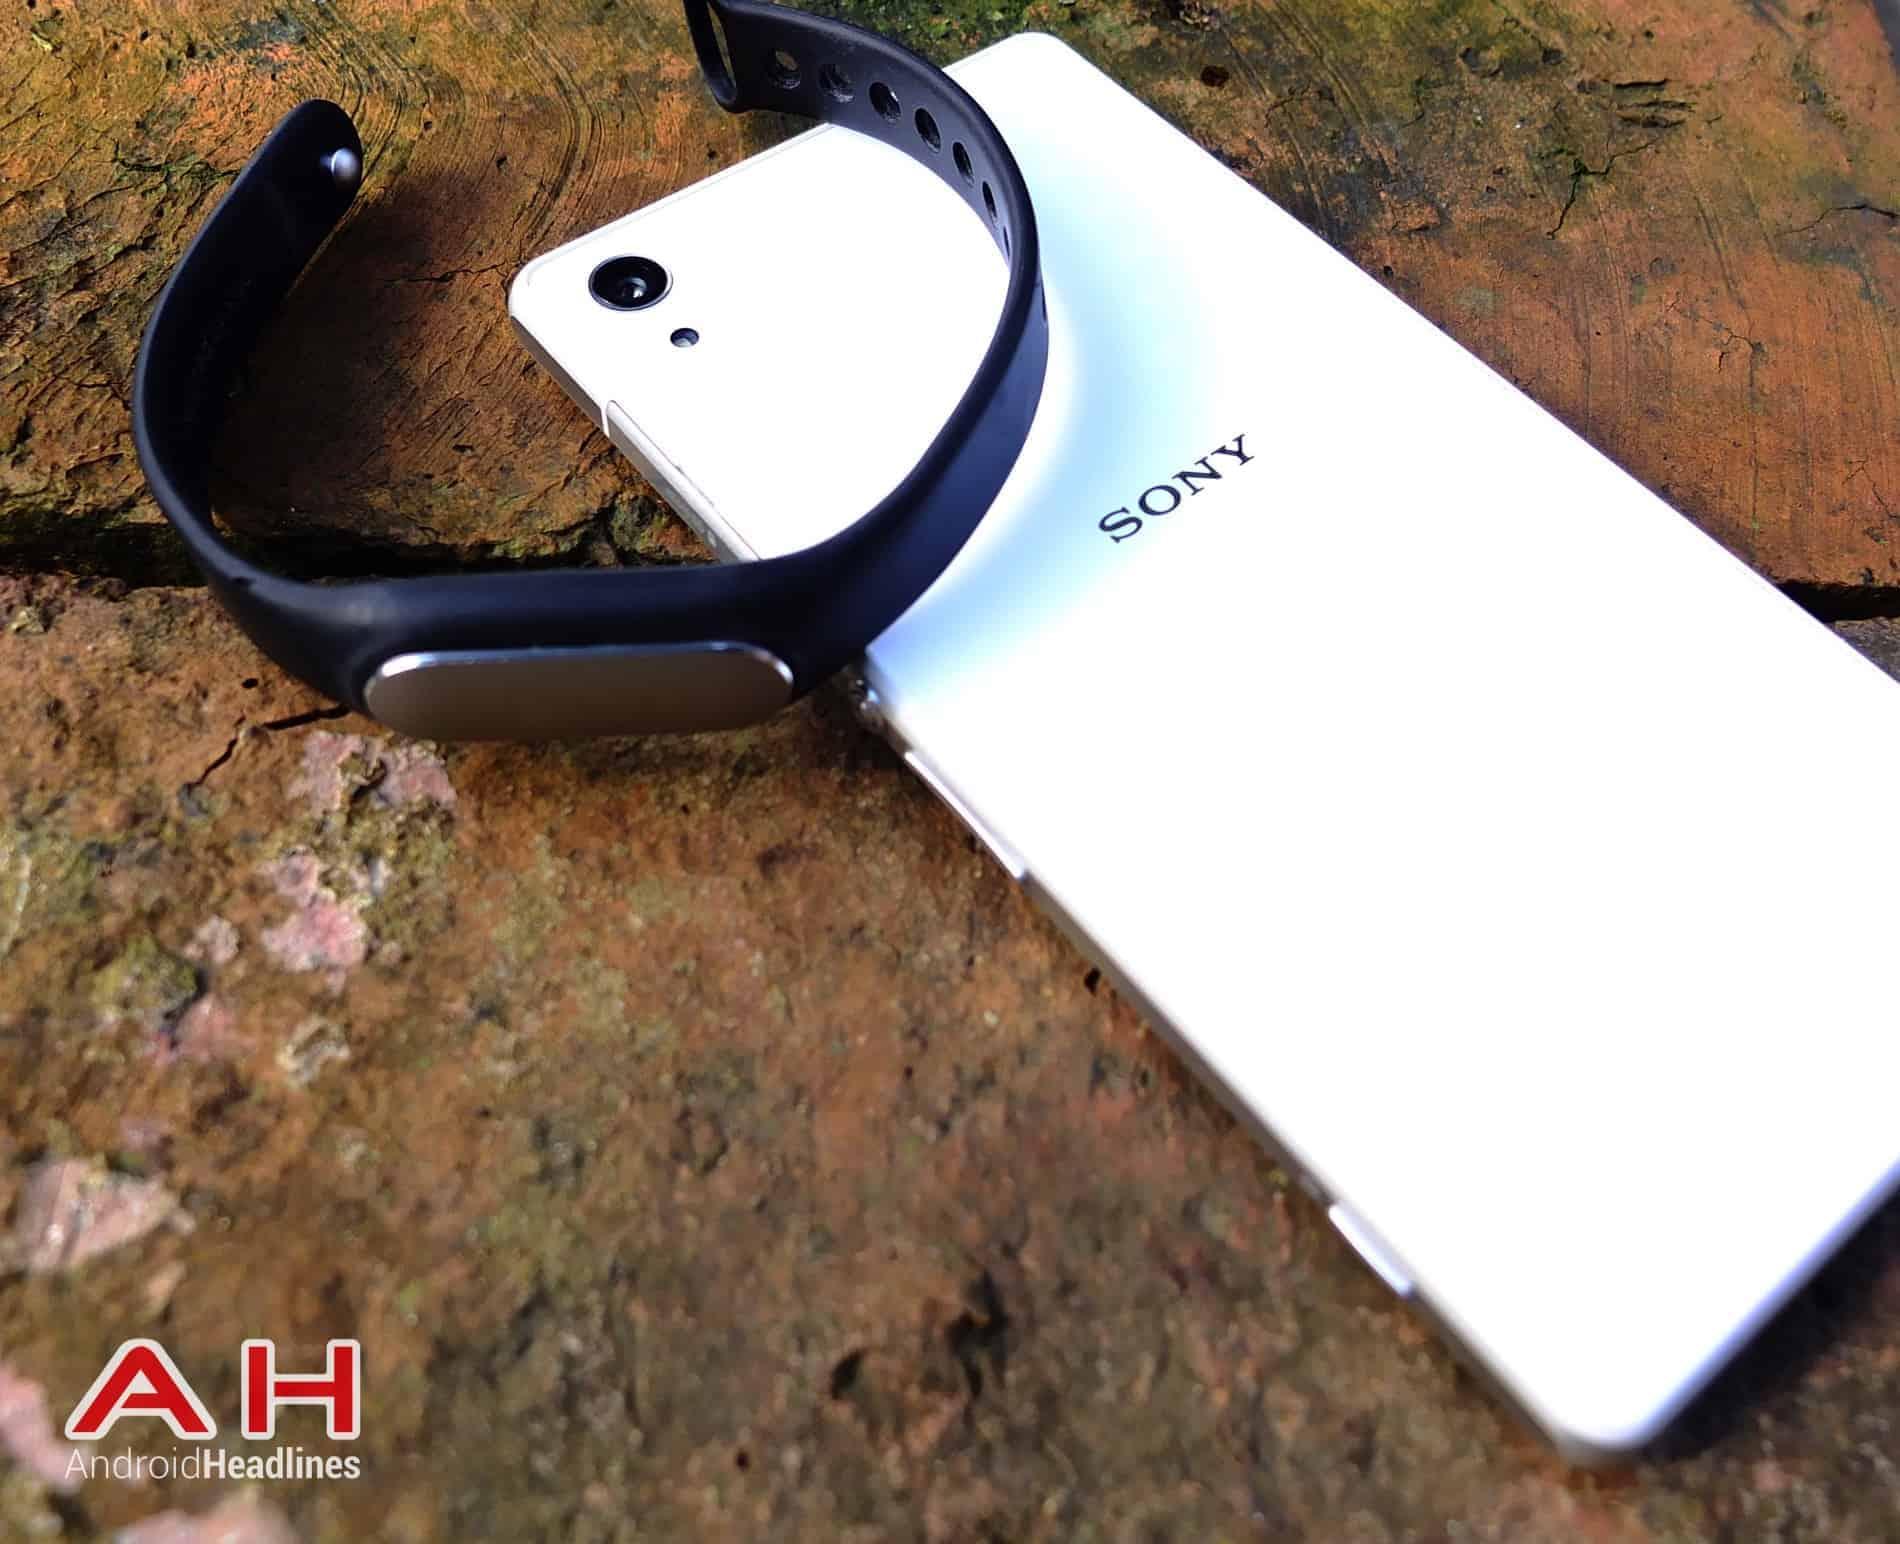 Xiaomi MI Band AH 09